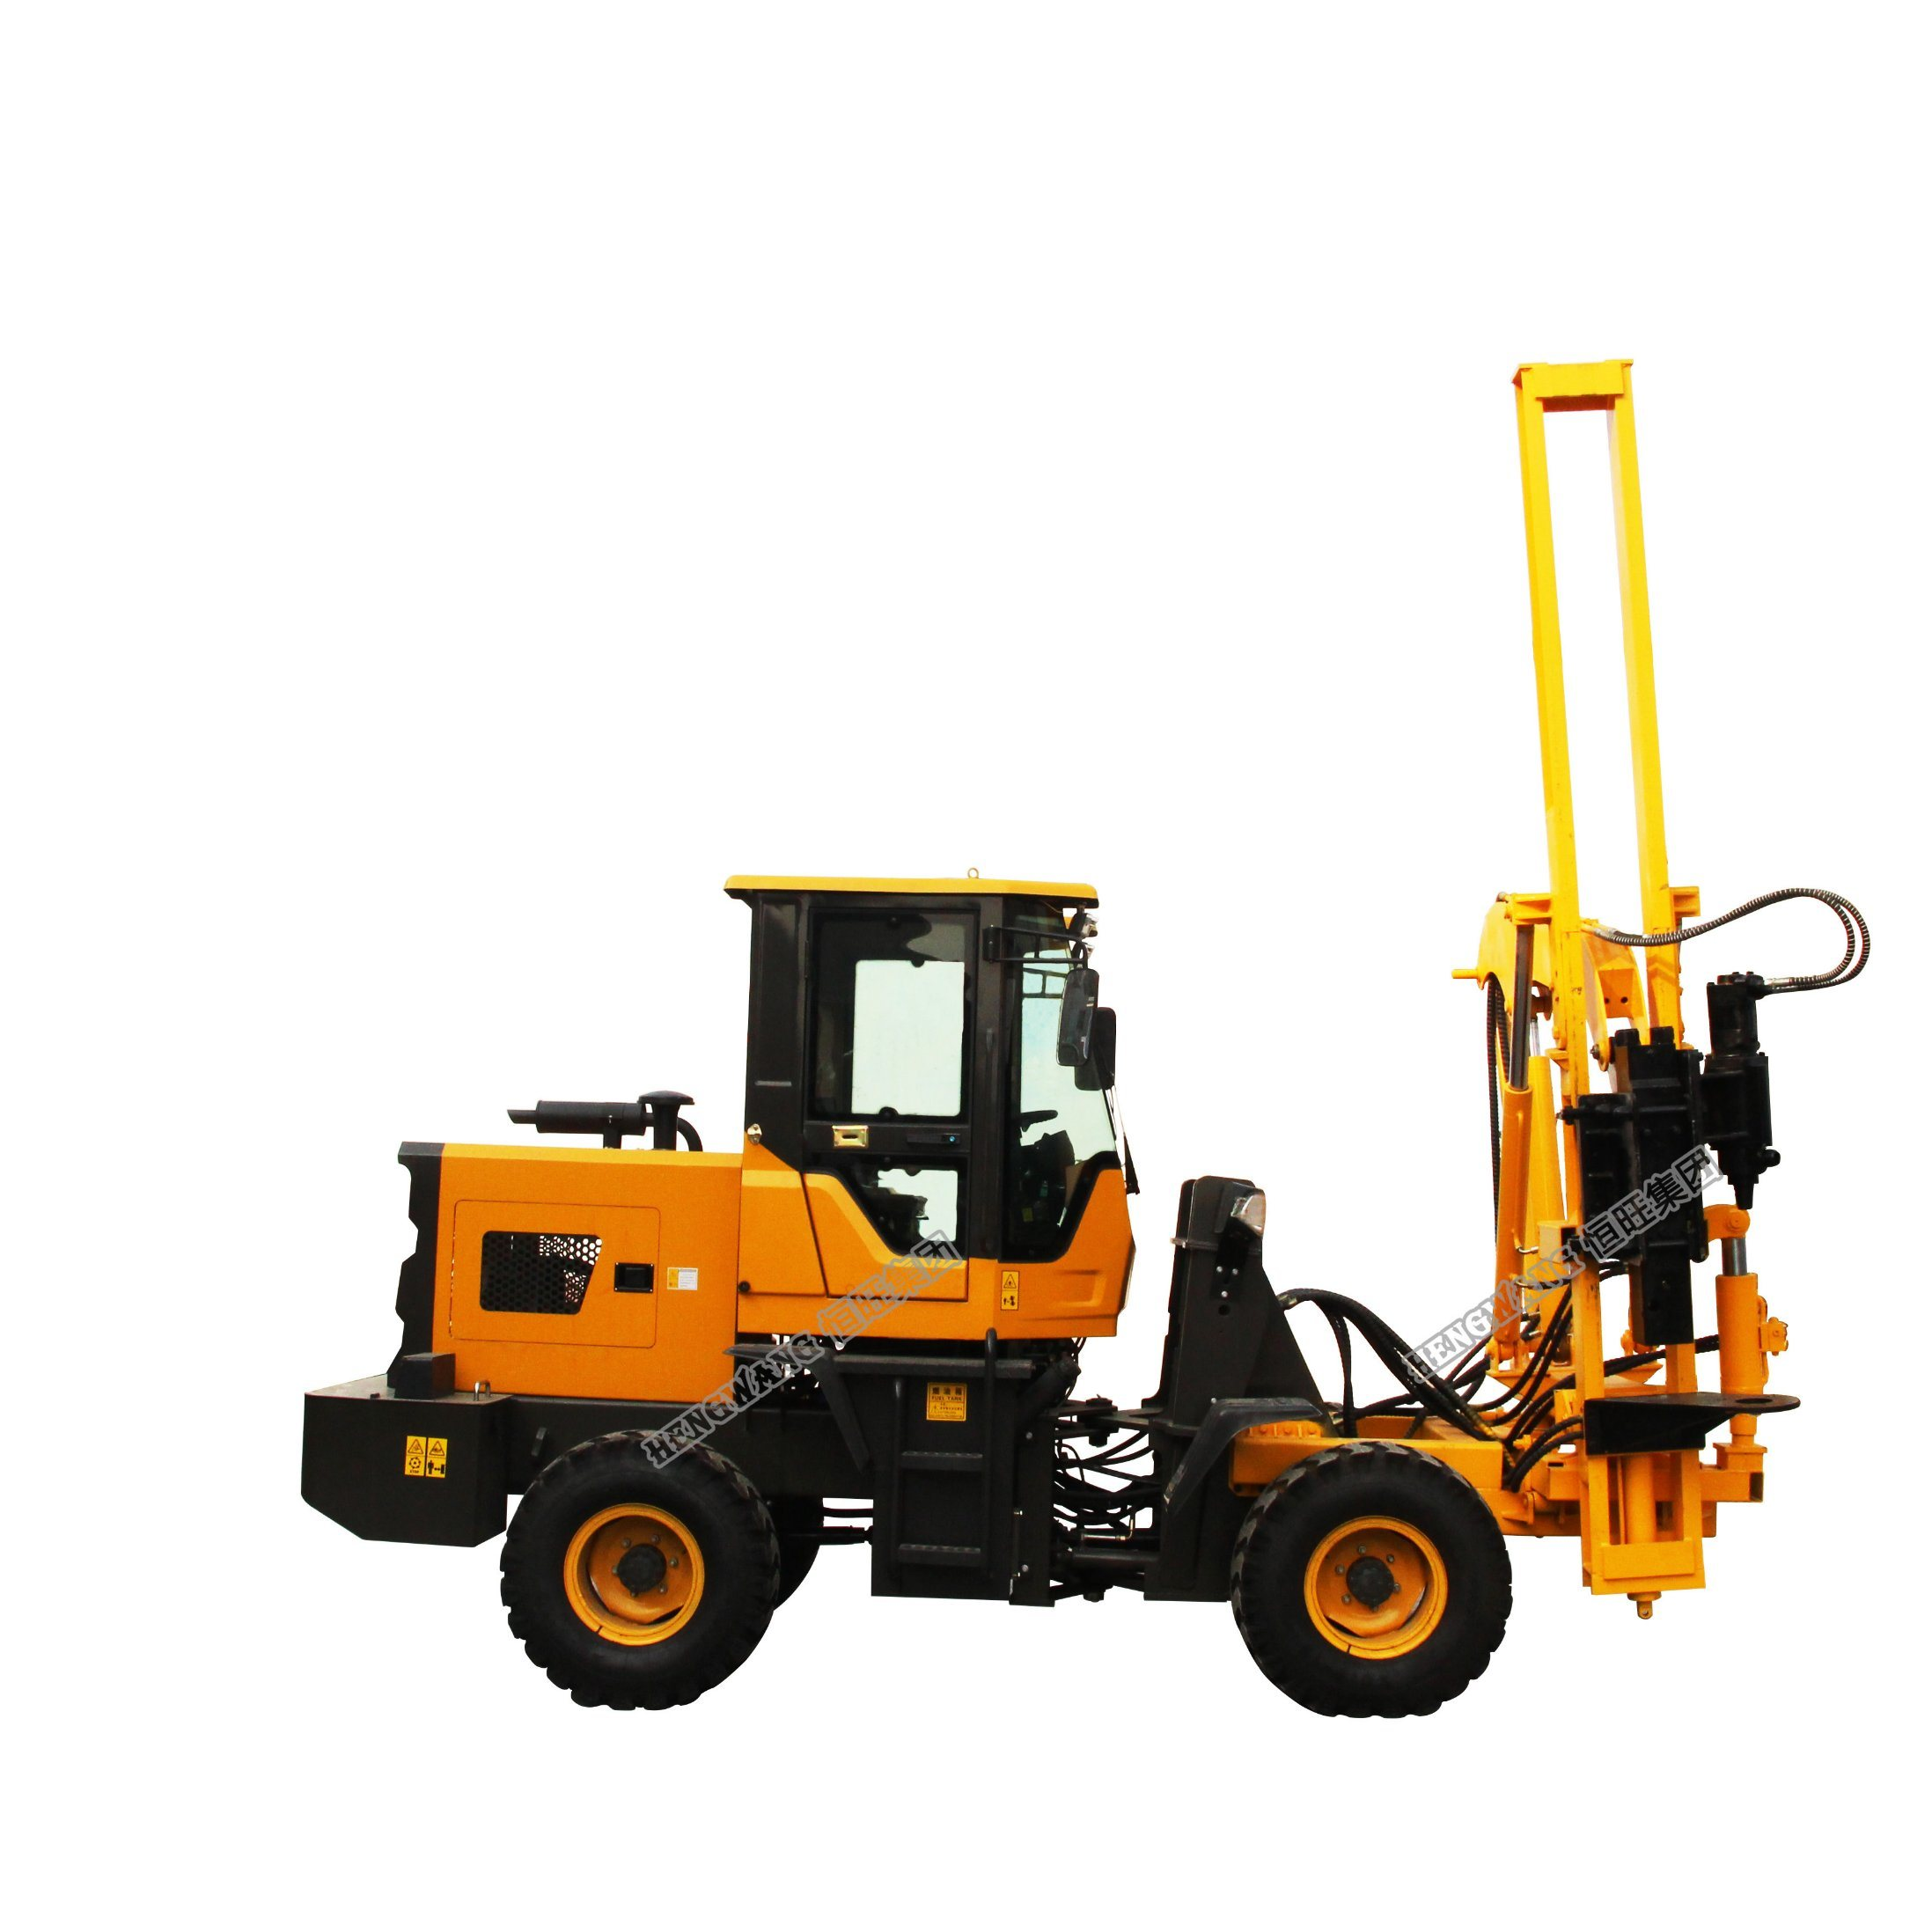 [Hot Item] Hydraulic Press Pneumatic Diesel Hammer Pile Driver